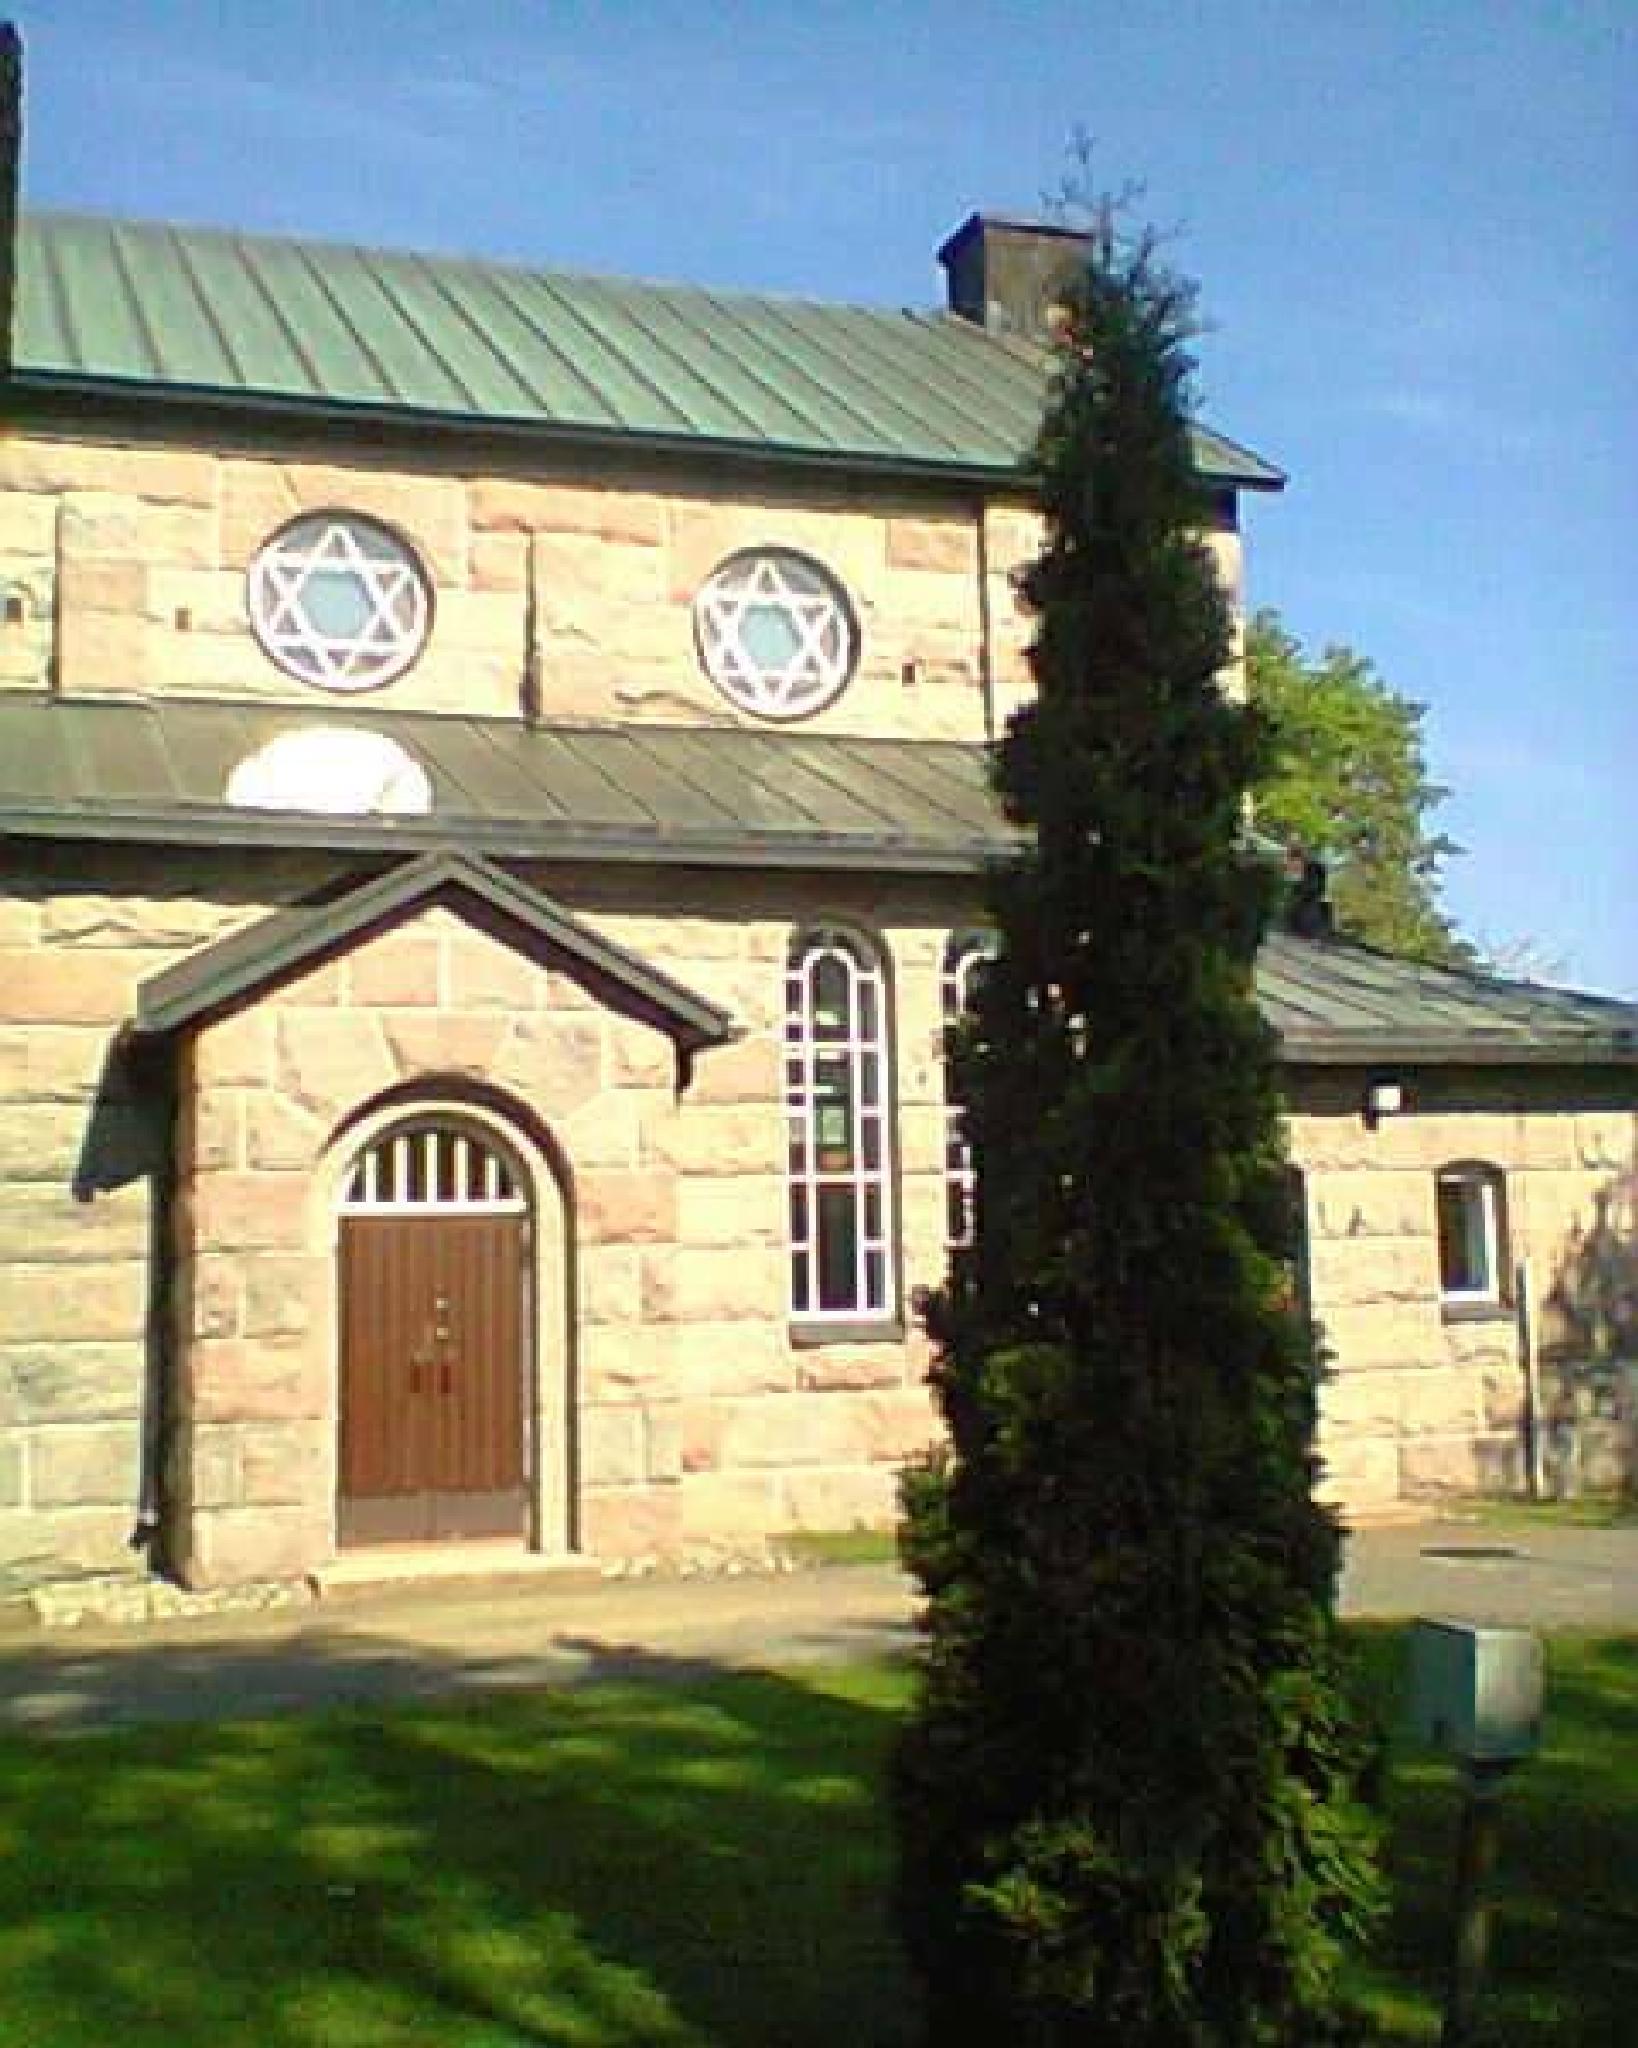 The Church of Kalvola, Pirkanmaa, Finland by ailahokkanen59